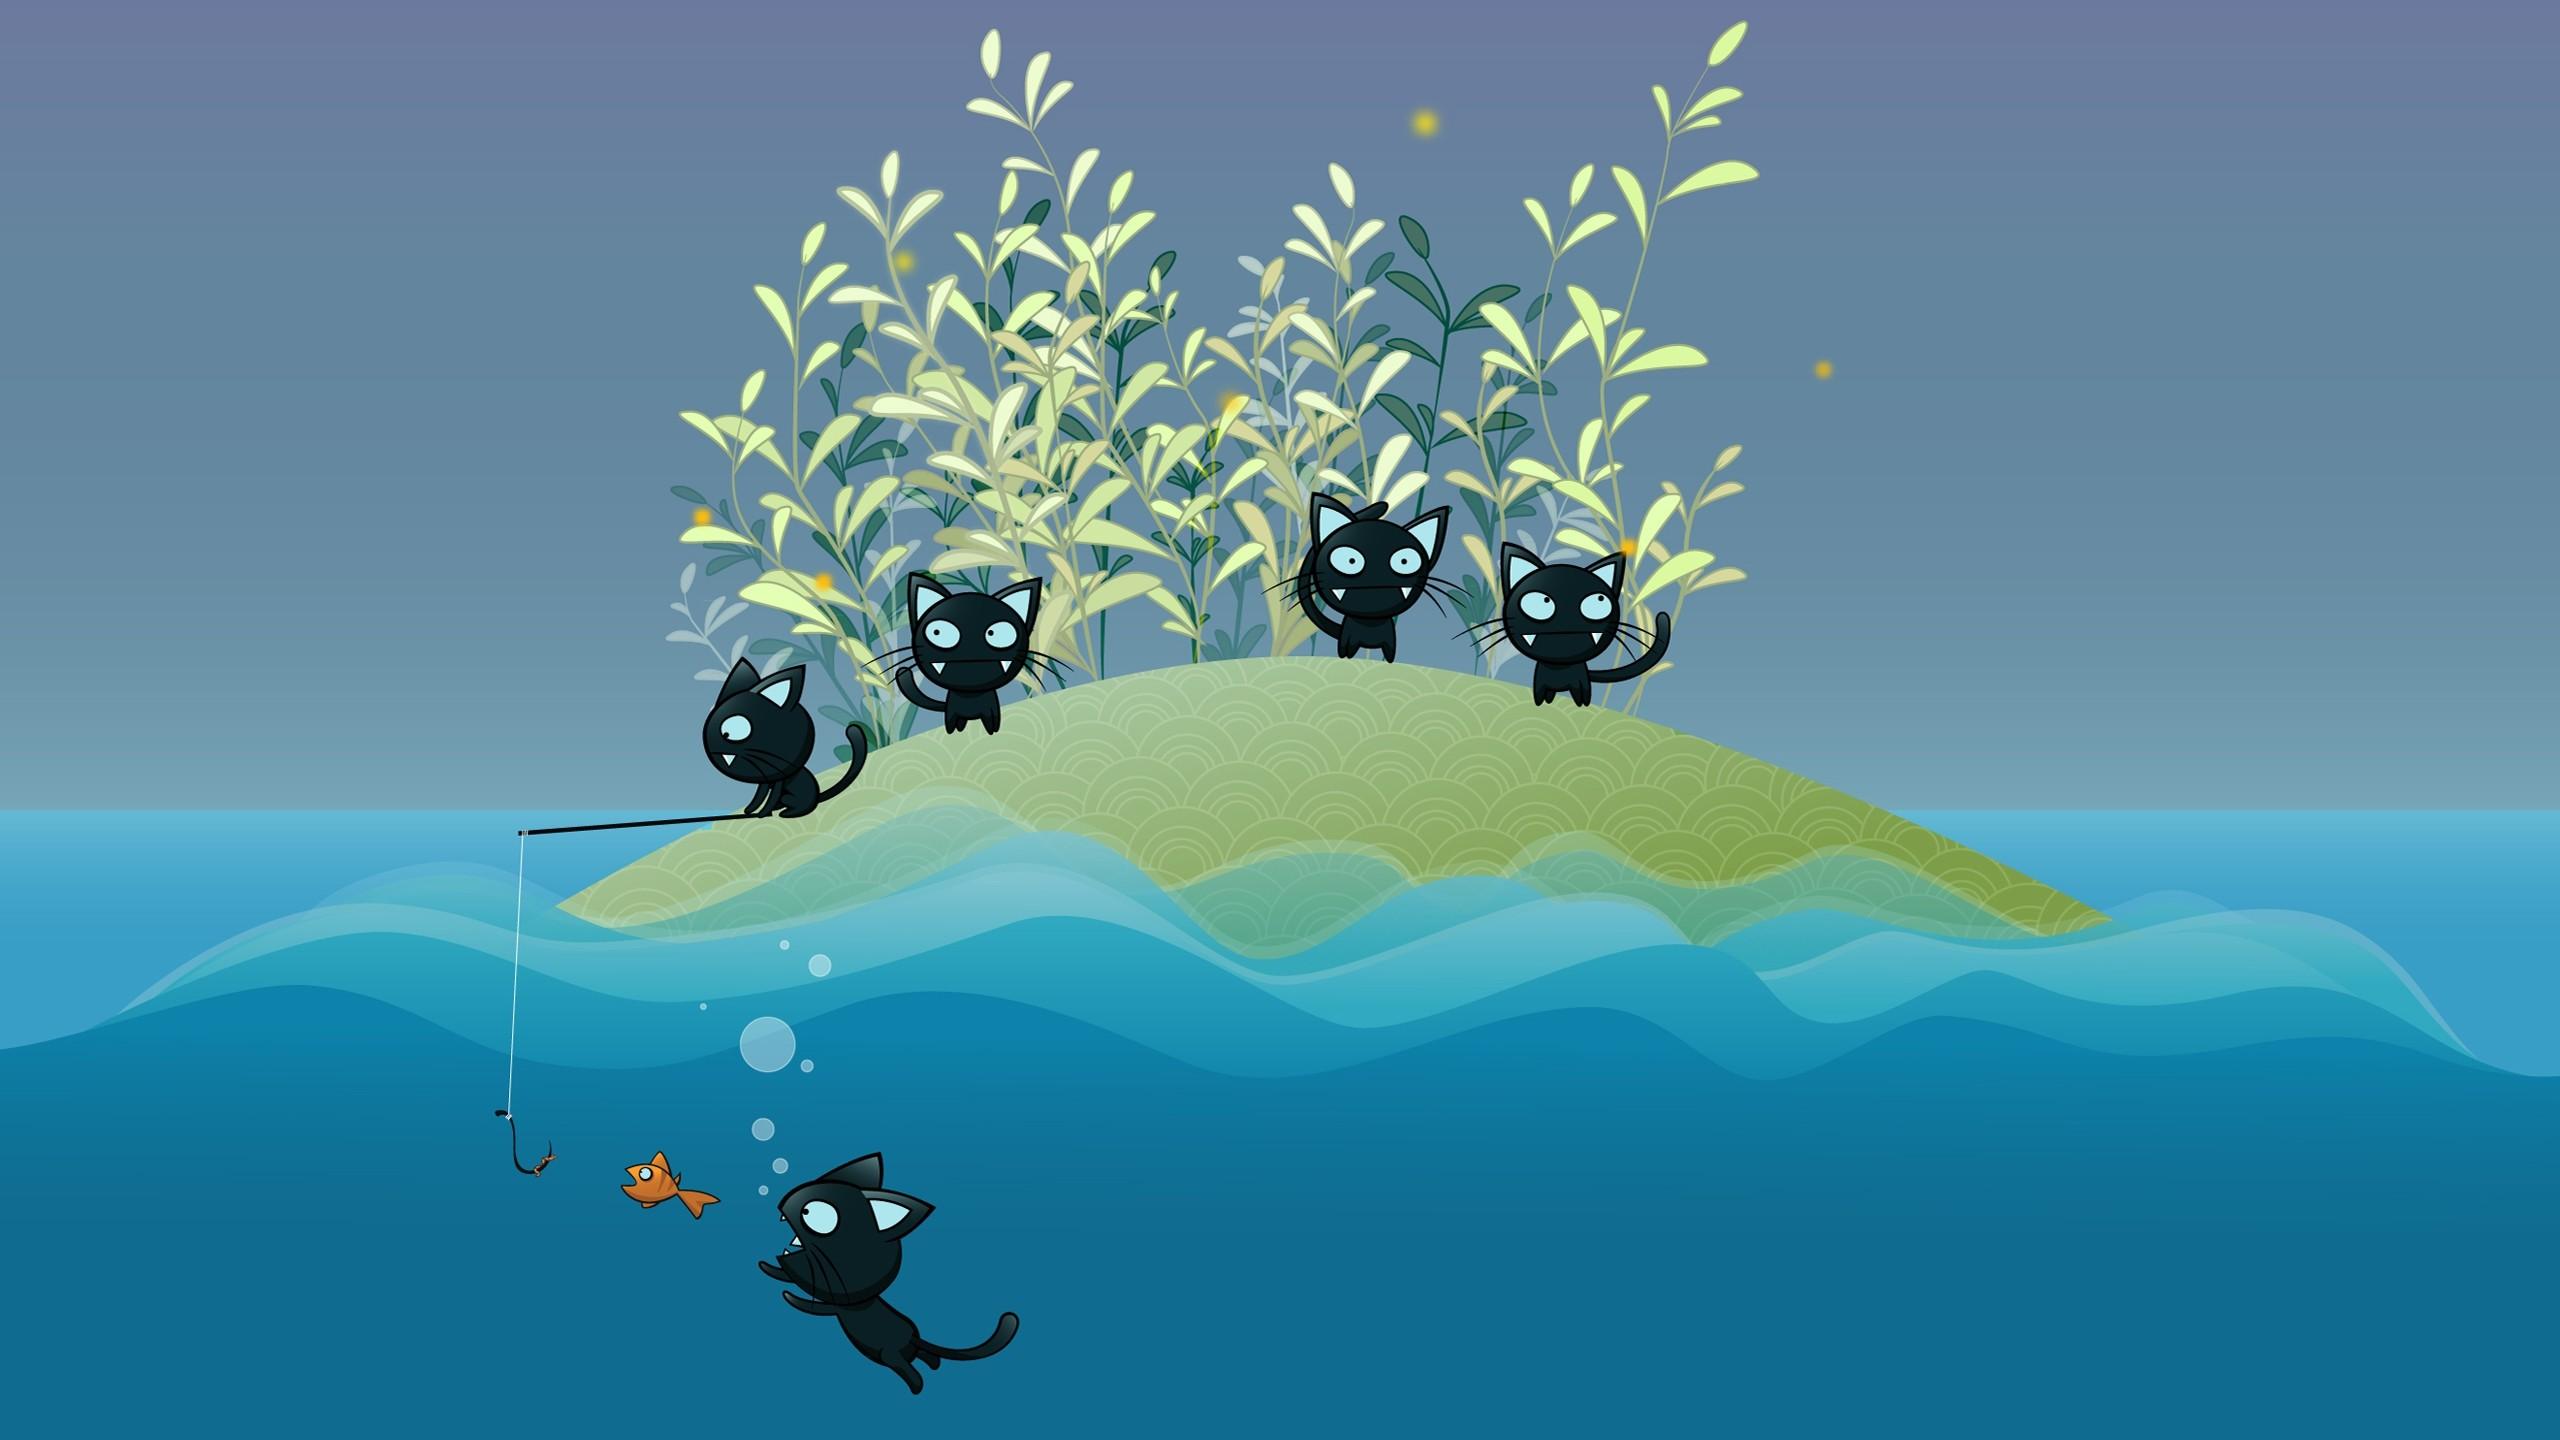 wallpaper.wiki-Cartoon-Cat-Image-HD-PIC-WPE0010020